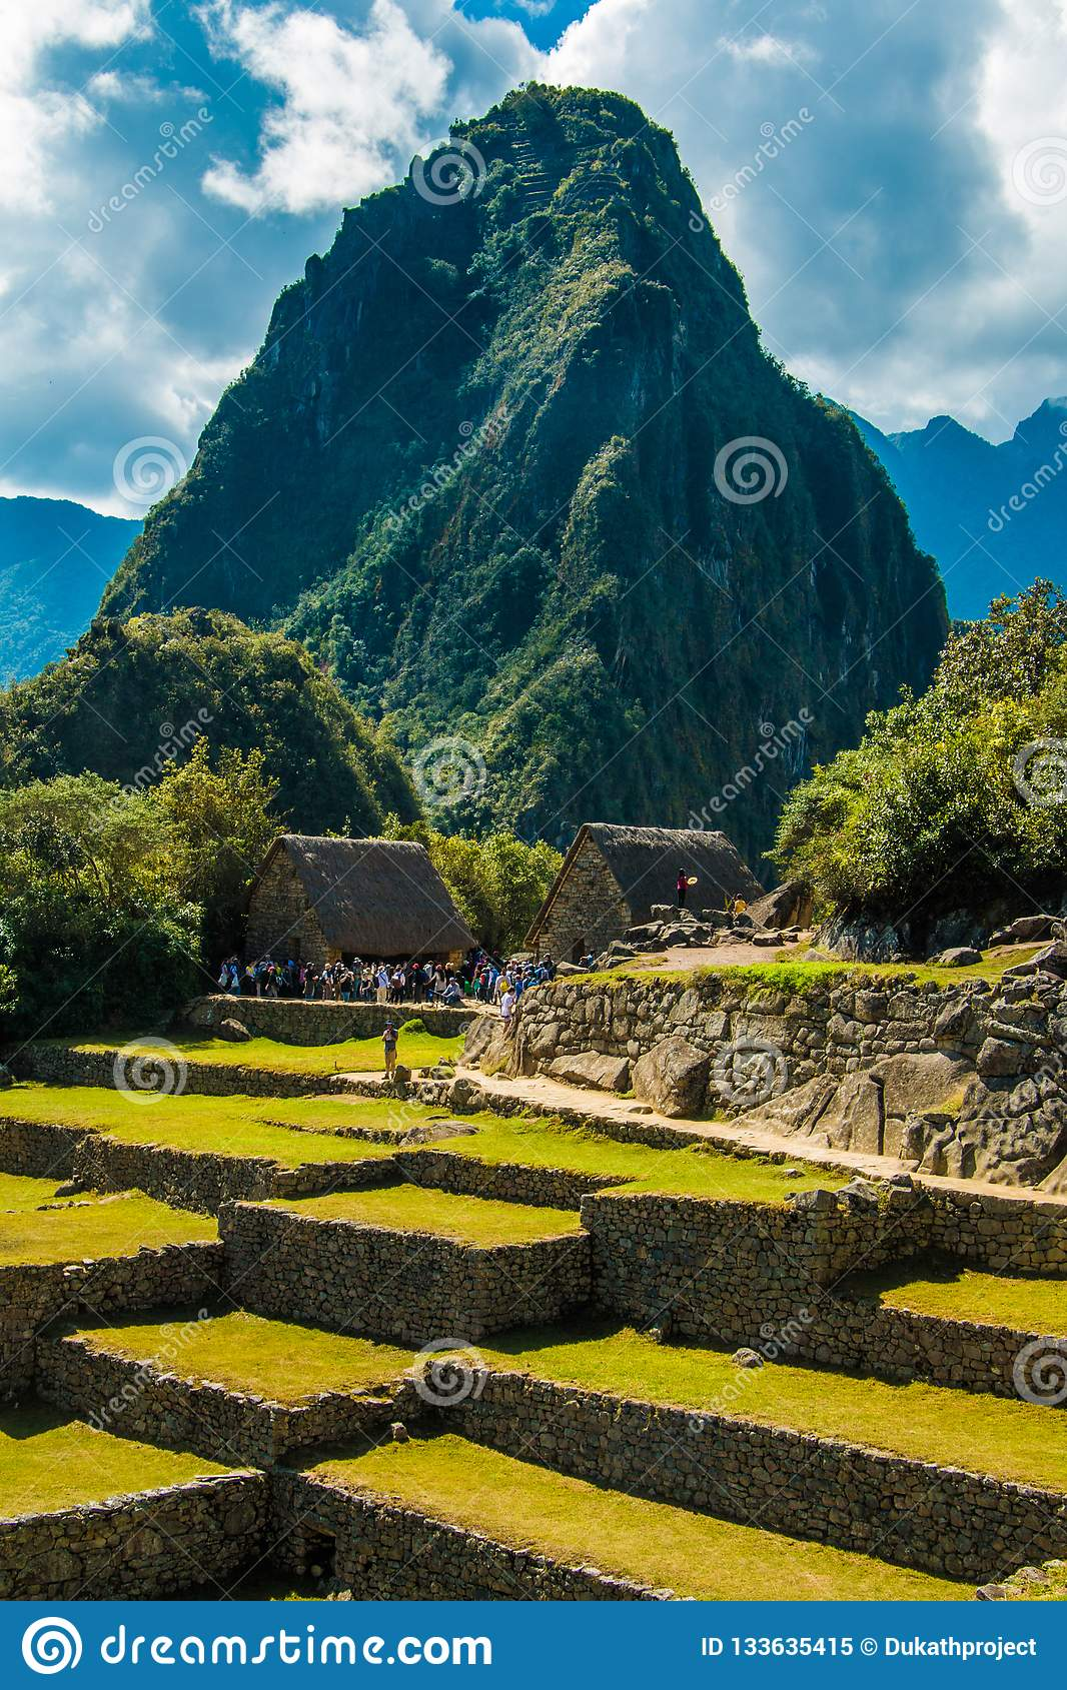 Beautiful Machu Picchu Ruins View